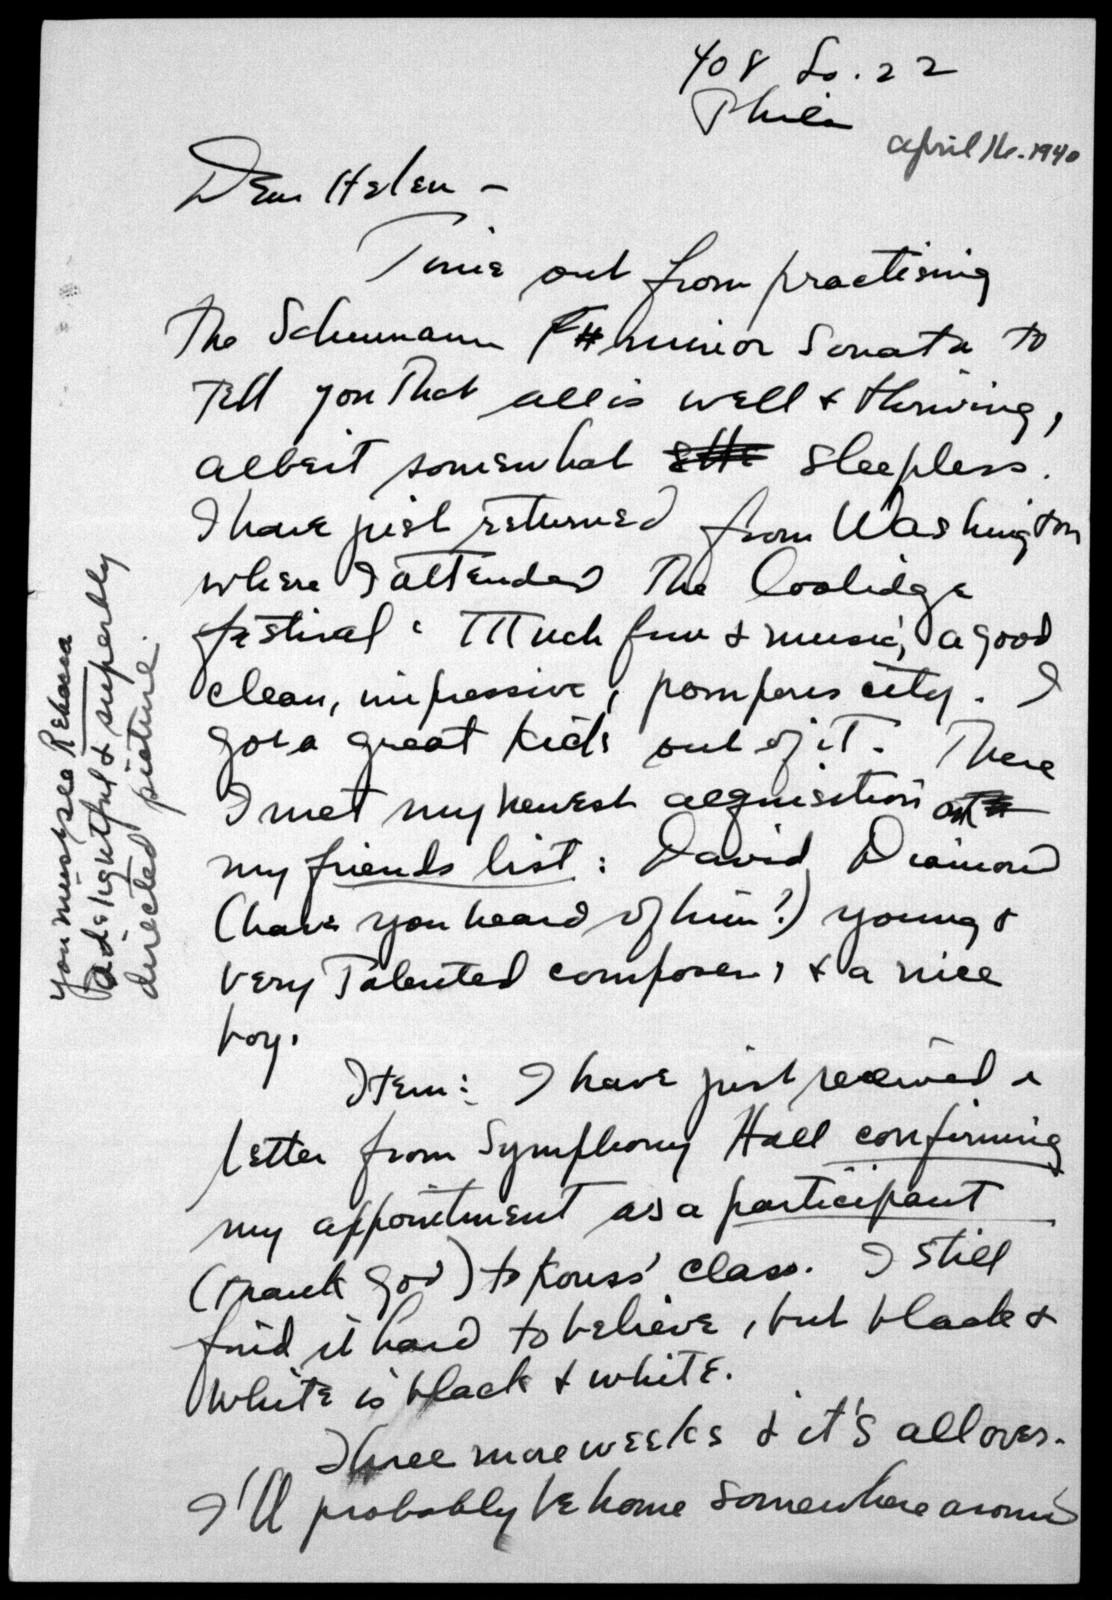 Letter from Leonard Bernstein to Helen Coates, April 16, 1940